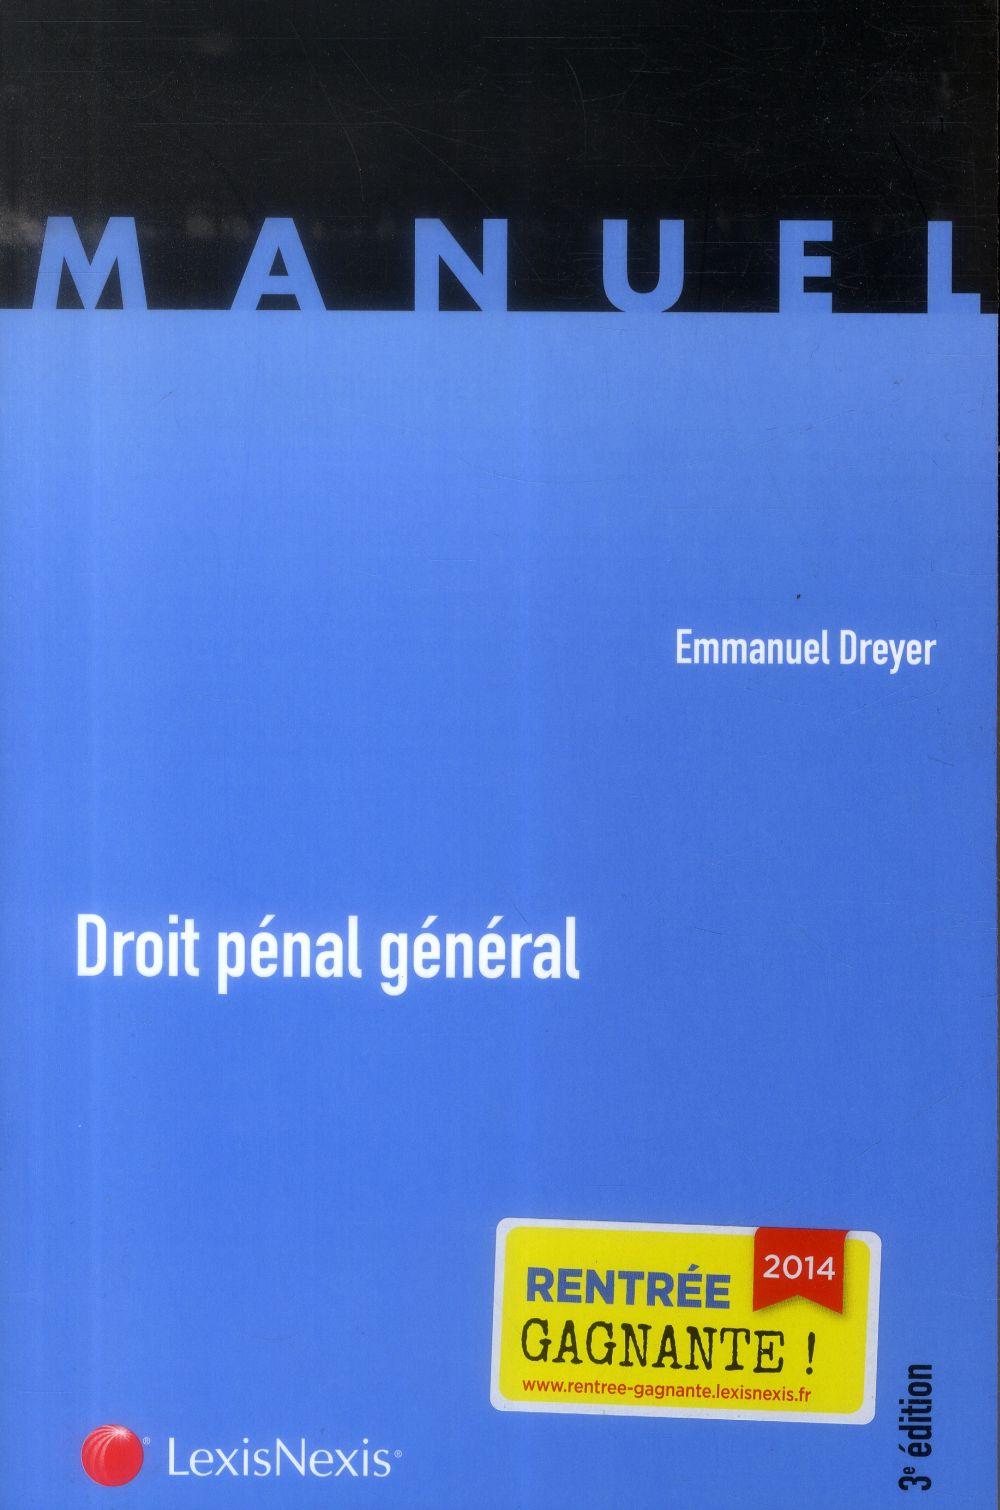 Droit Penal General 3e Edition Emmanuel Dreyer Lexisnexis Grand Format Dalloz Librairie Paris